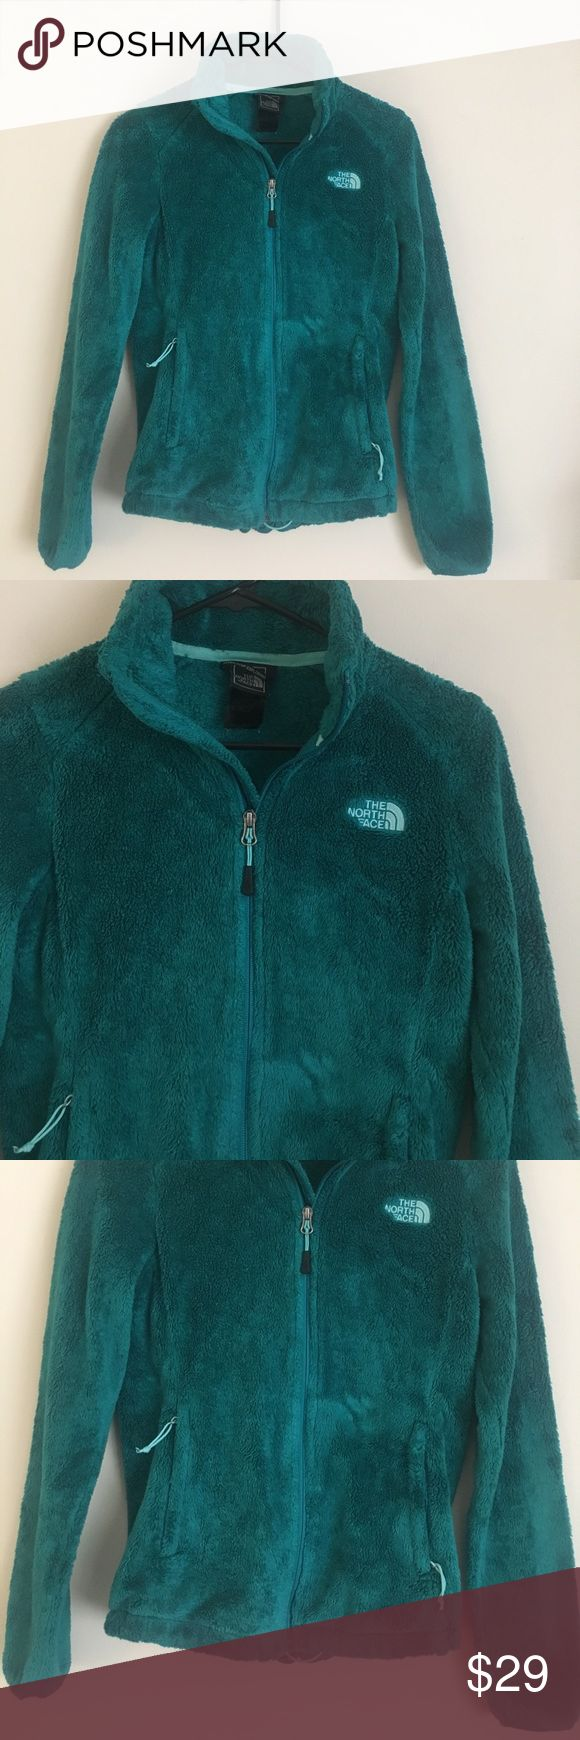 North Face XS Kelly green zip up fleece jacket Trendy fun and warm North Face XS Kelly green zip up fleece jacket with two front side zip pockets. North Face Tops Sweatshirts & Hoodies